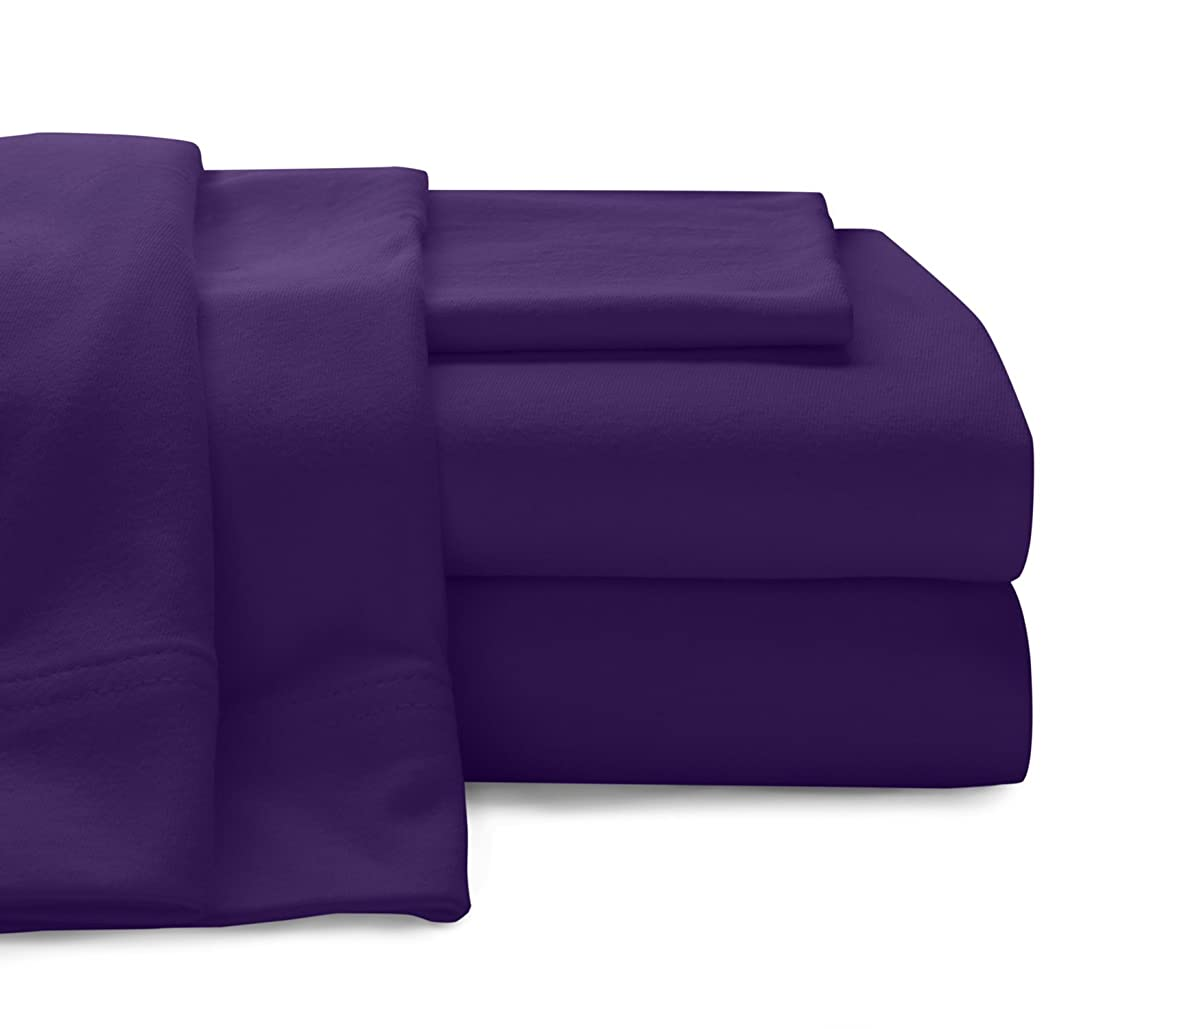 Baltic Linen Jersey Cotton Sheet Set Twin Purple 3-Piece Set